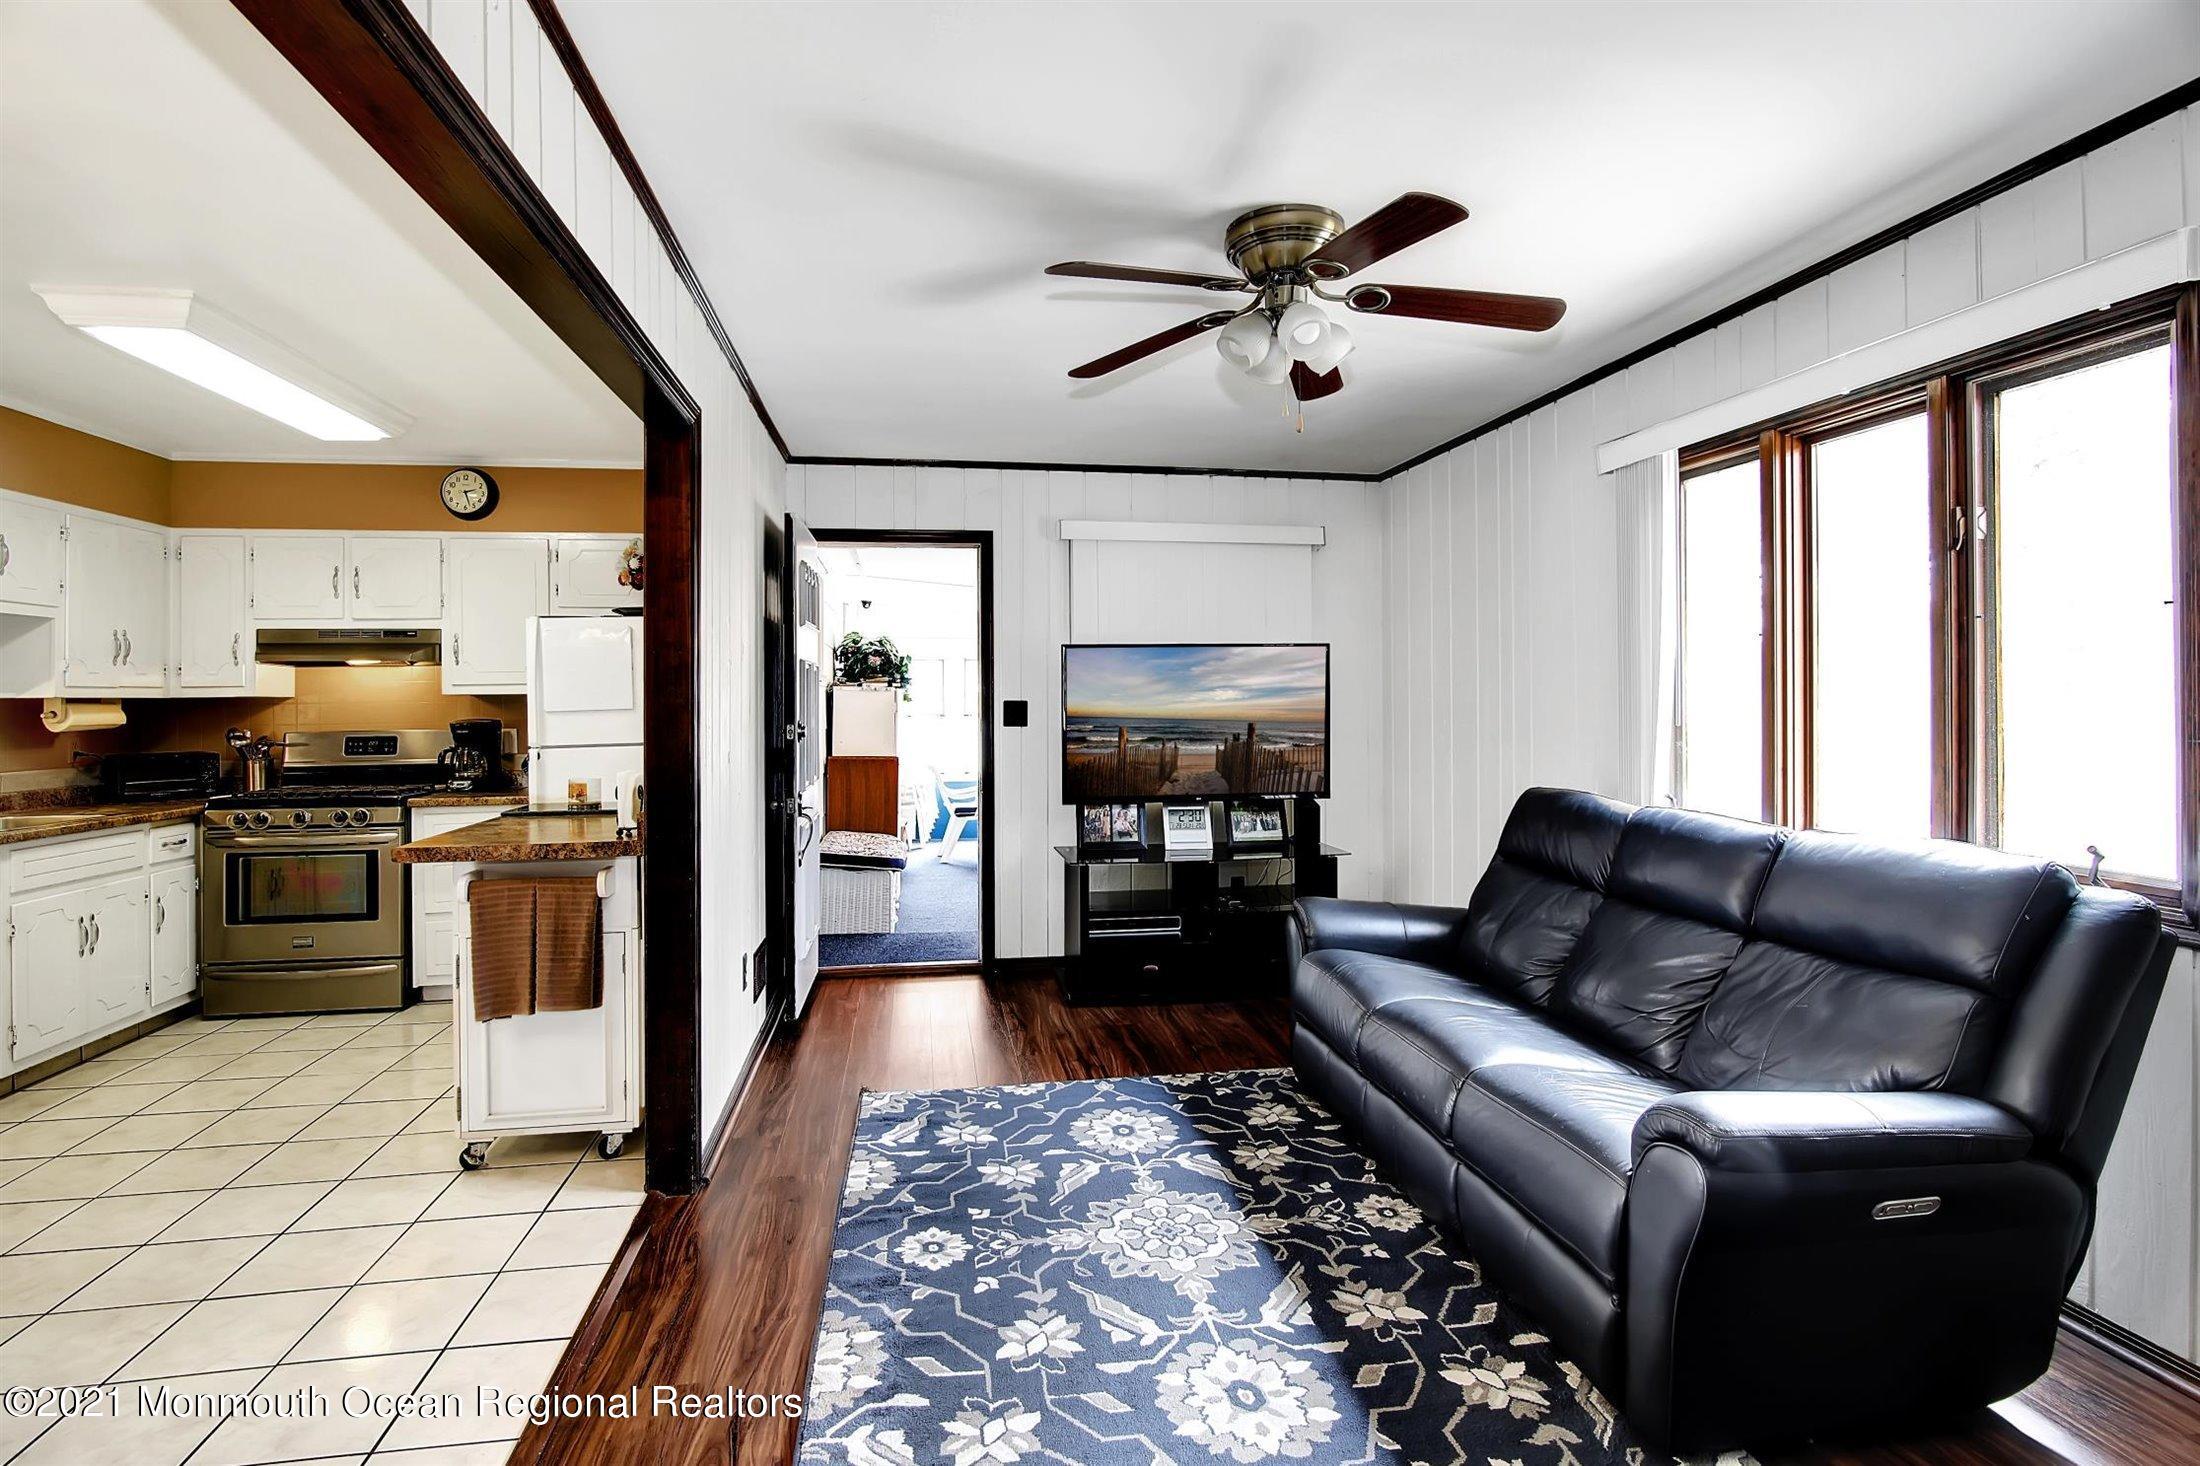 684 Dunedin Street, Toms River, New Jersey 08753, 4 Bedrooms Bedrooms, ,2 BathroomsBathrooms,Single Family,For Sale,684 Dunedin Street,1,22111516